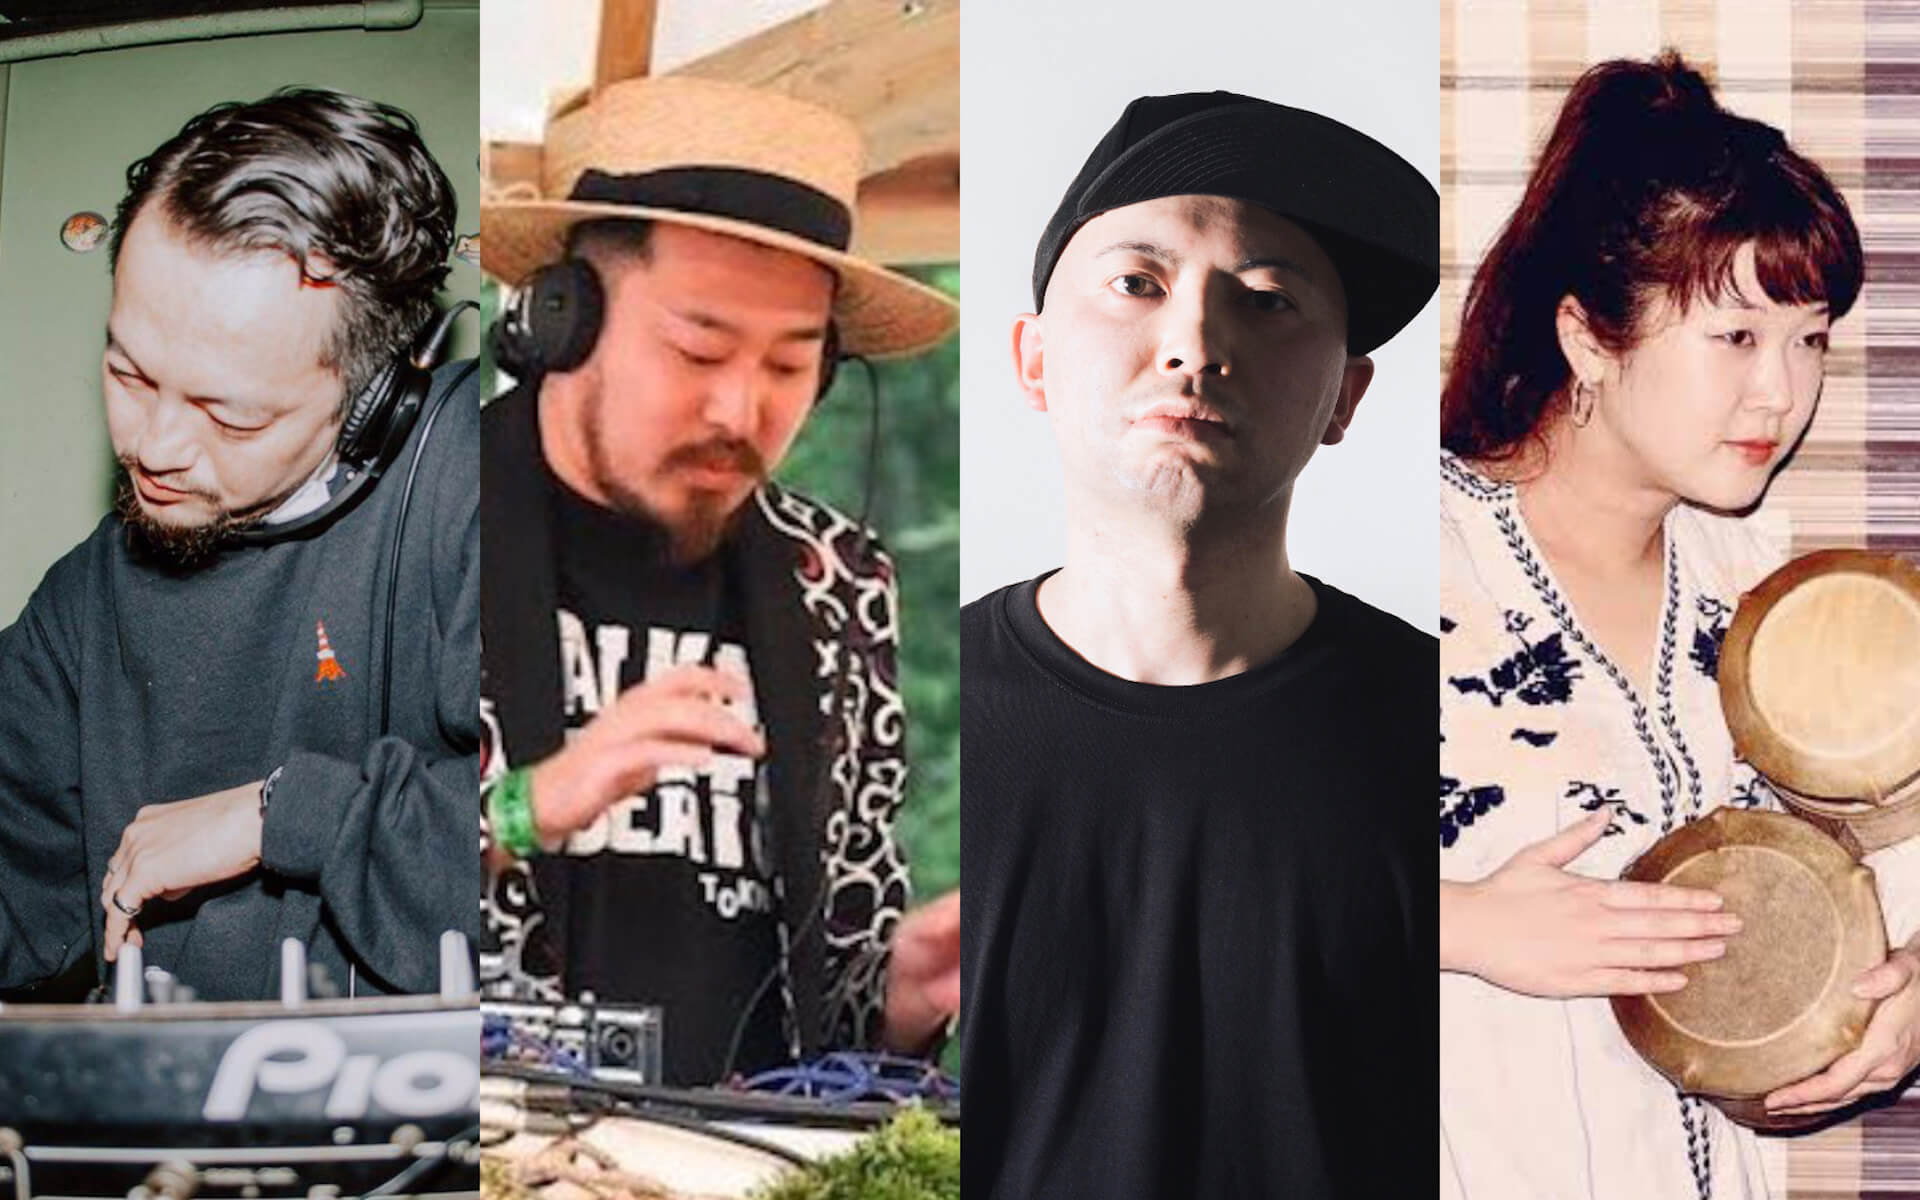 Contact Tokyoにてワールドミュージックの桃源郷<CRAZY BANANA presents HO-HAI 端午の節>が開催決定! music210420_ho-hai-2104120_2